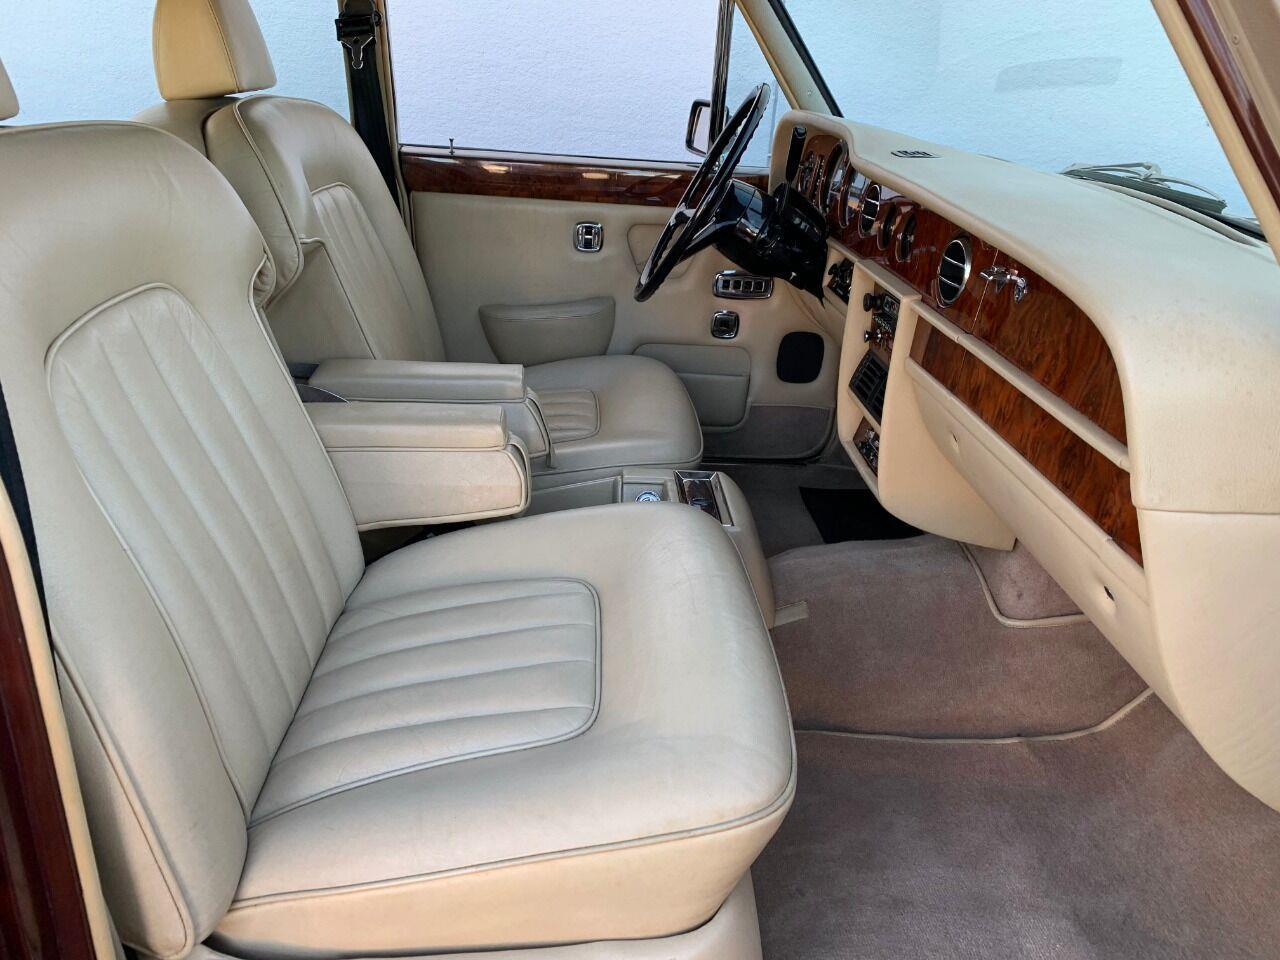 1980 Rolls-Royce Silver Shadow (CC-1388028) for sale in Carey, Illinois